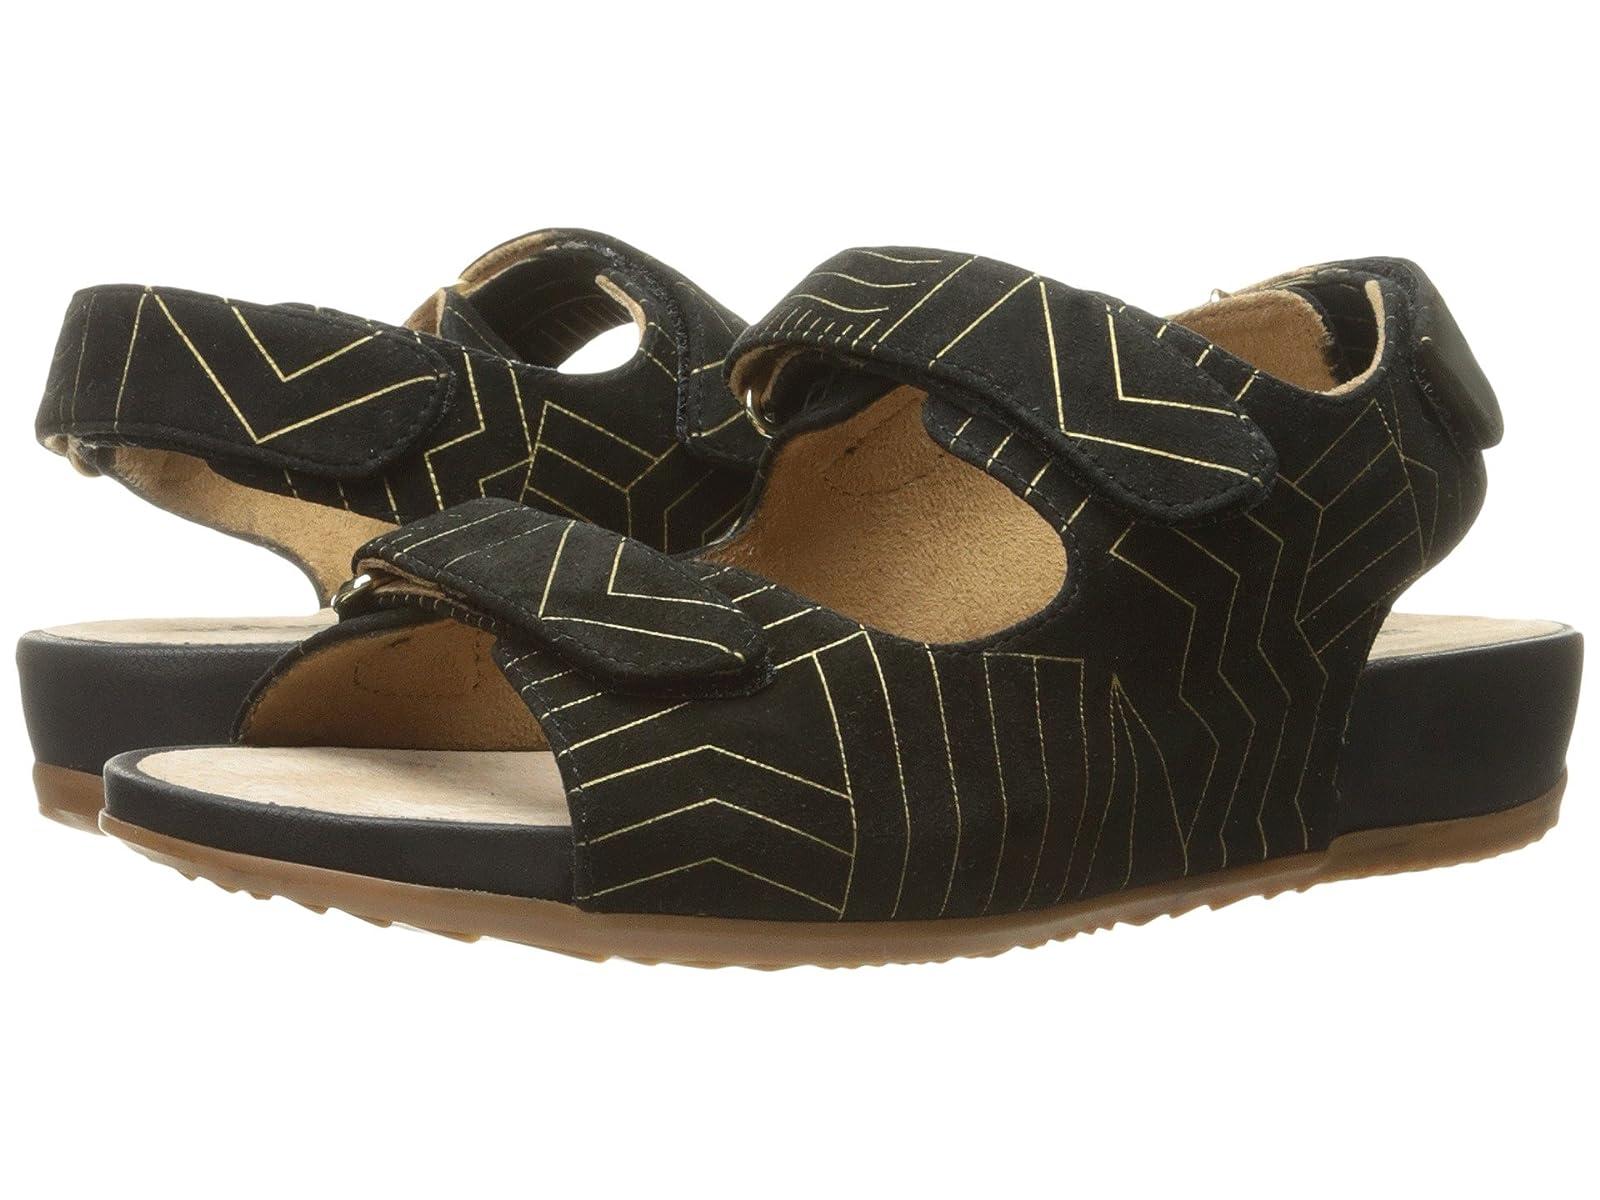 SoftWalk Dana PointCheap and distinctive eye-catching shoes